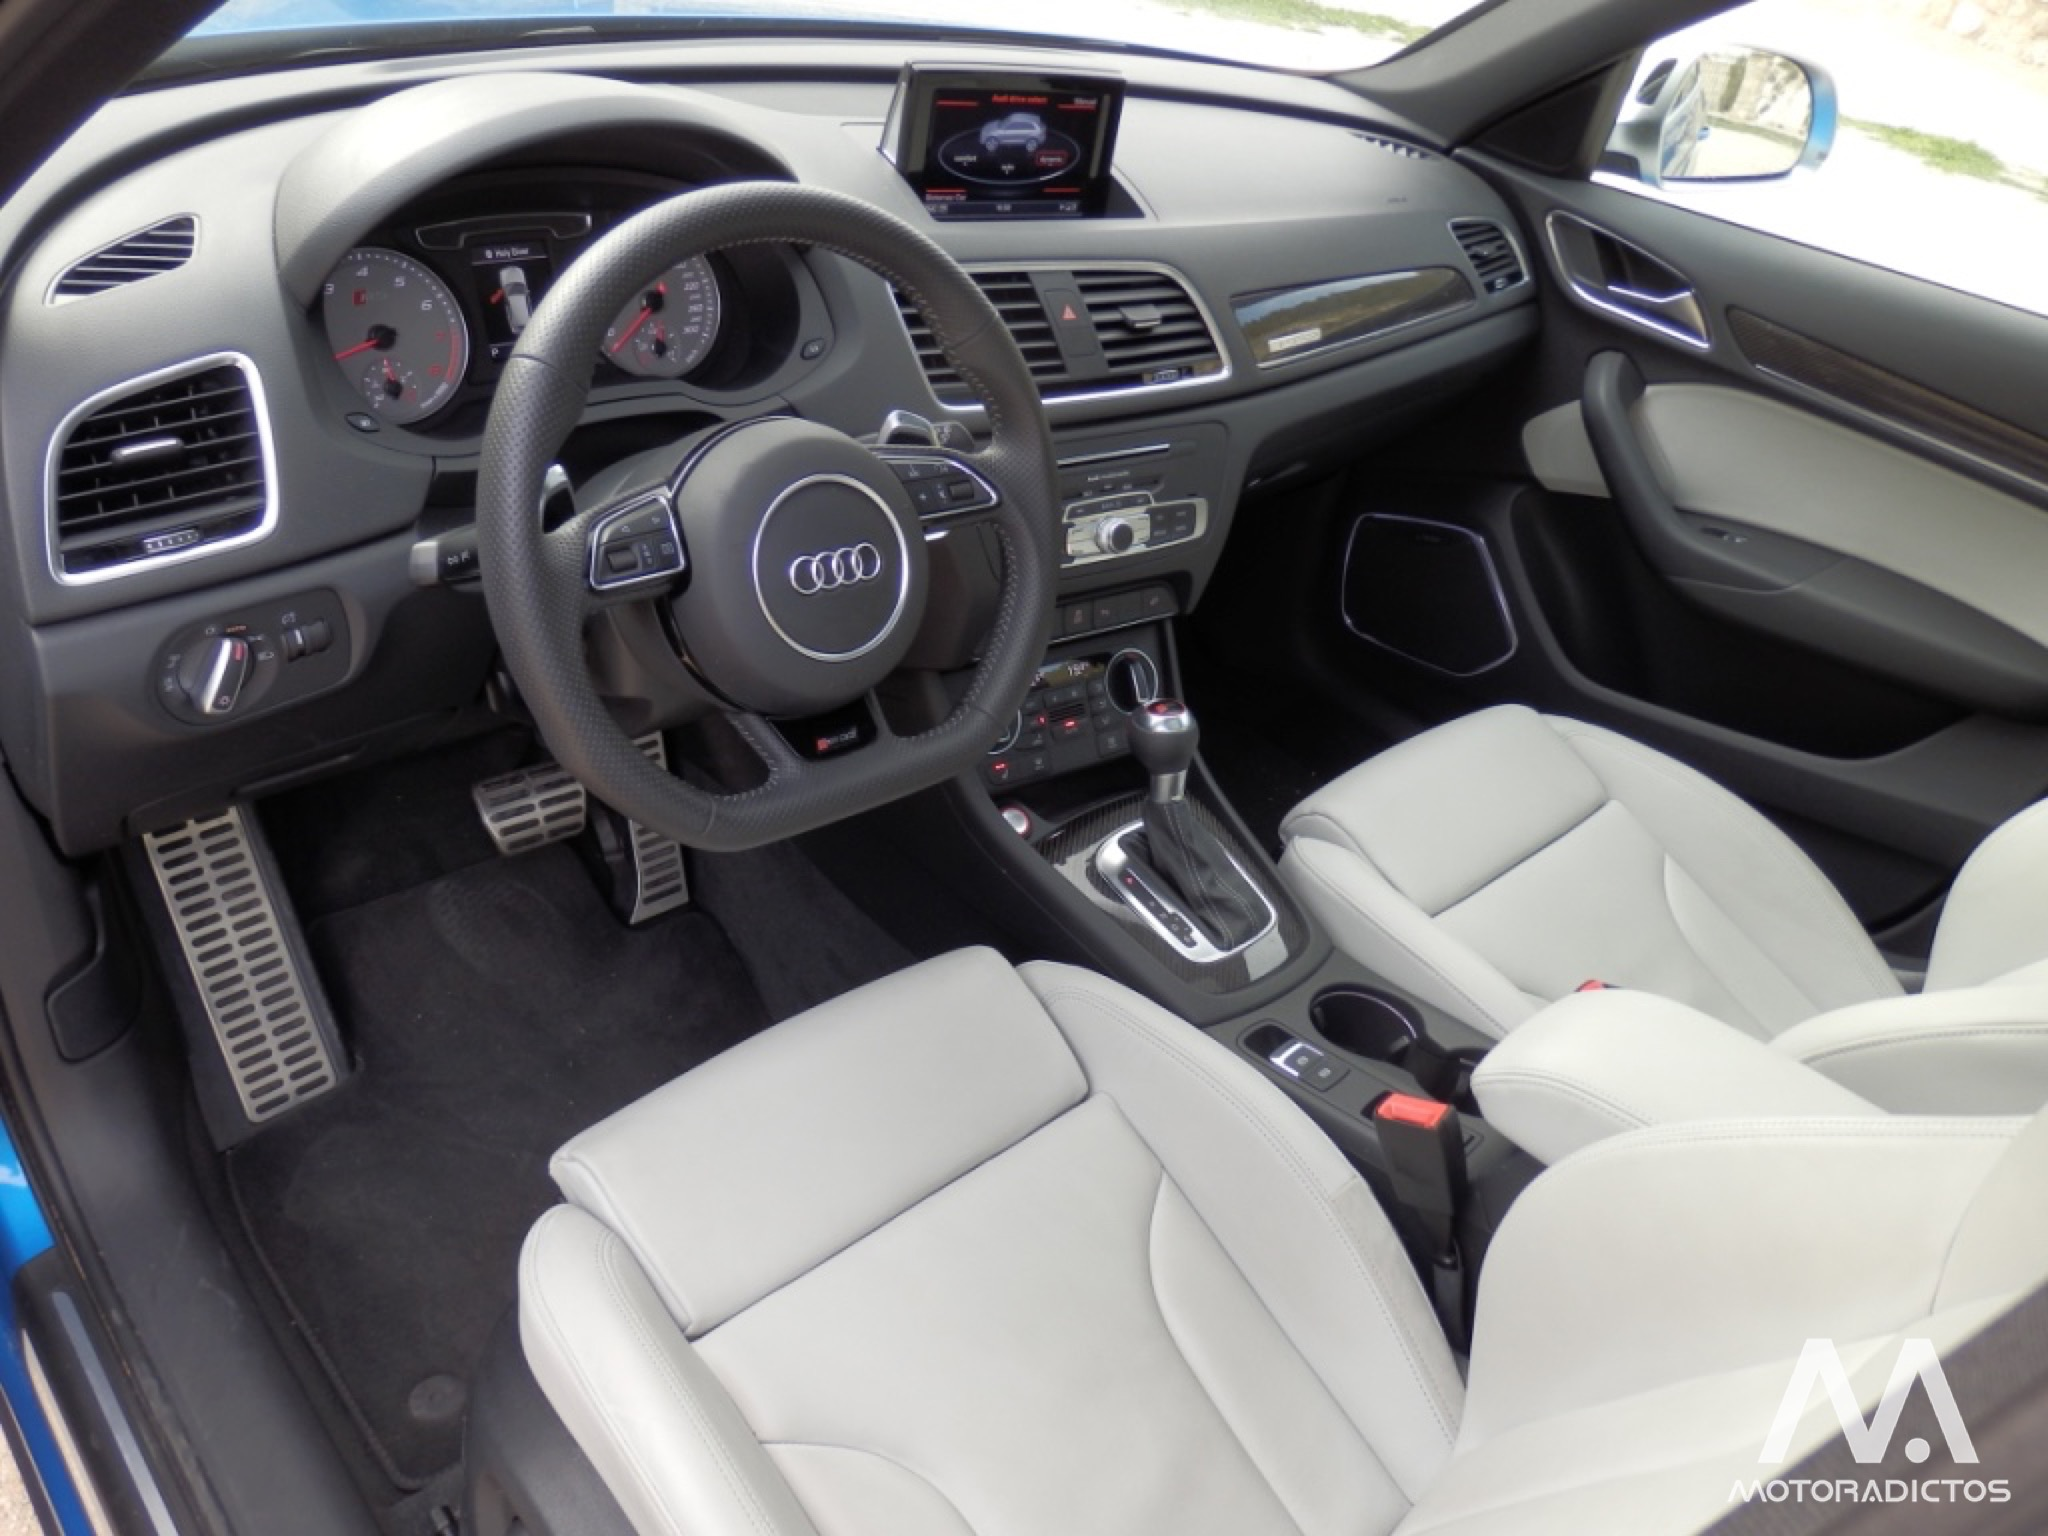 Prueba: Audi RS Q3 2.5 TFSI 340 CV (diseño, habitáculo, mecánica) 15